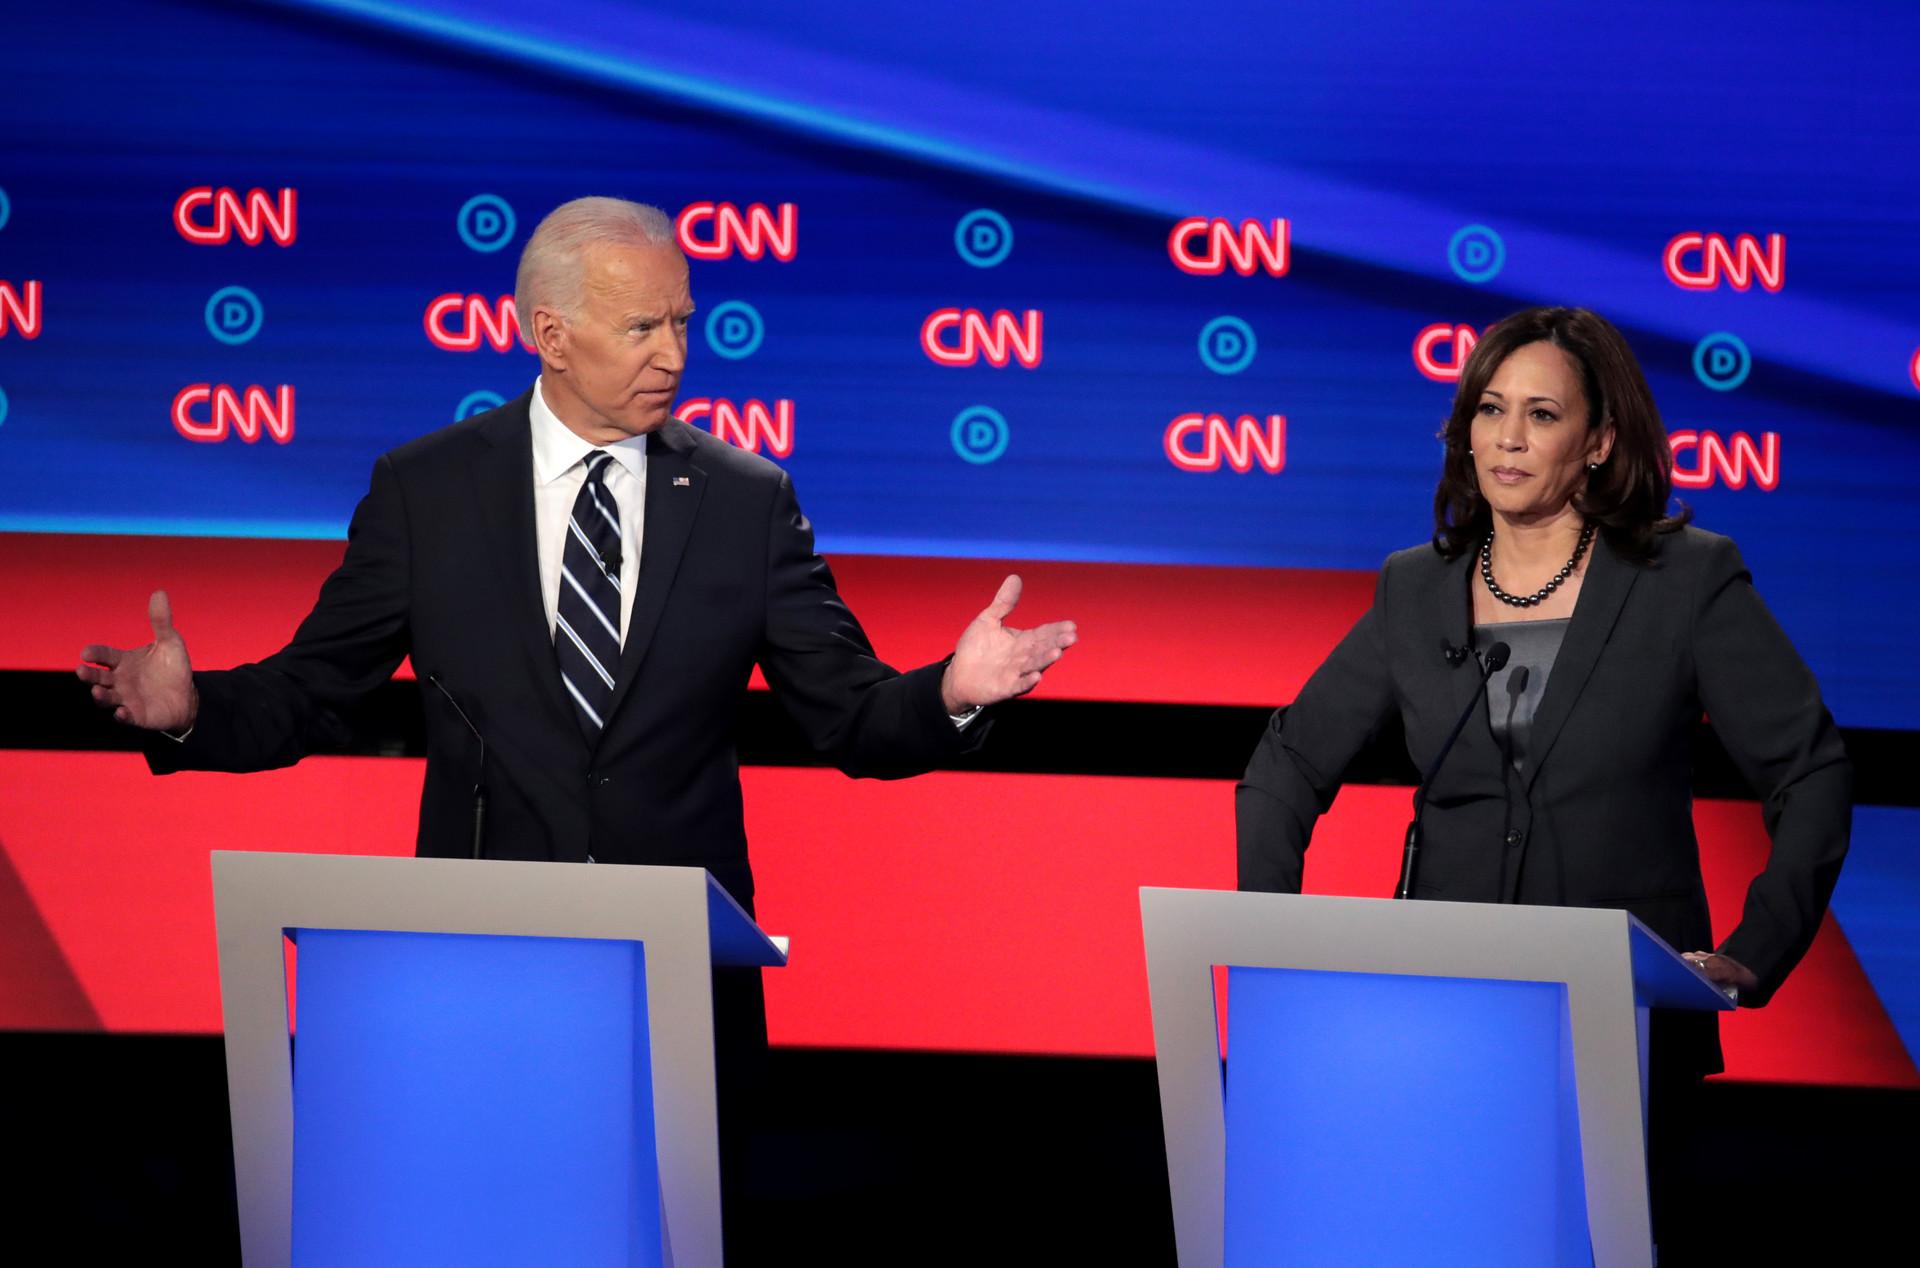 Democratic presidential candidate former Vice President Joe Biden (L) and Sen. Kamala Harris (D-CA) during the Democratic Presidential Debate at the Fox Theatre on July 31, 2019, in Detroit, Michigan.